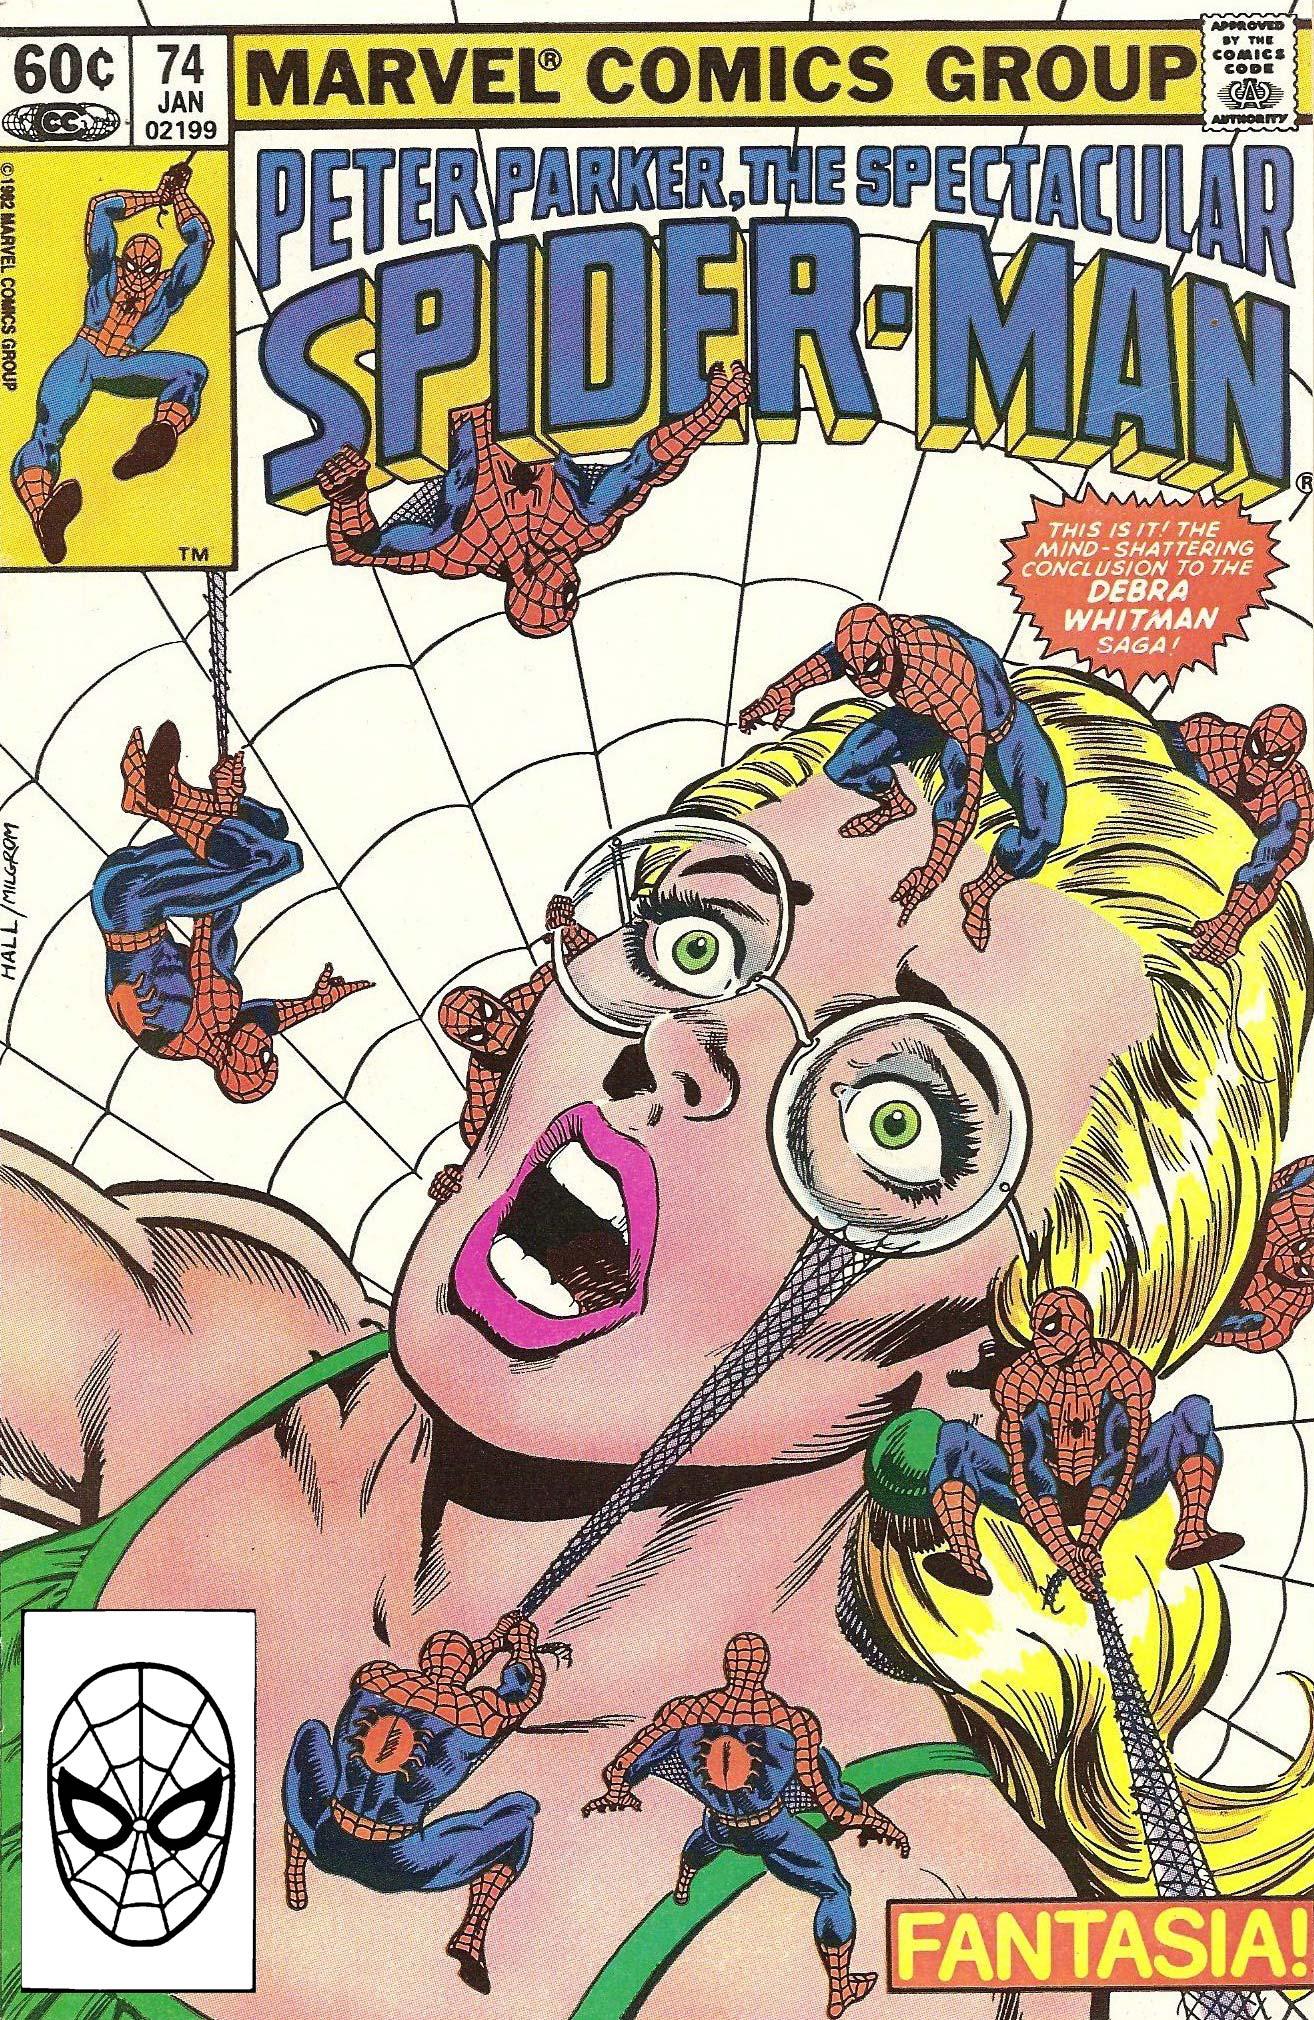 Peter Parker, the Spectacular Spider-Man (1976) #74